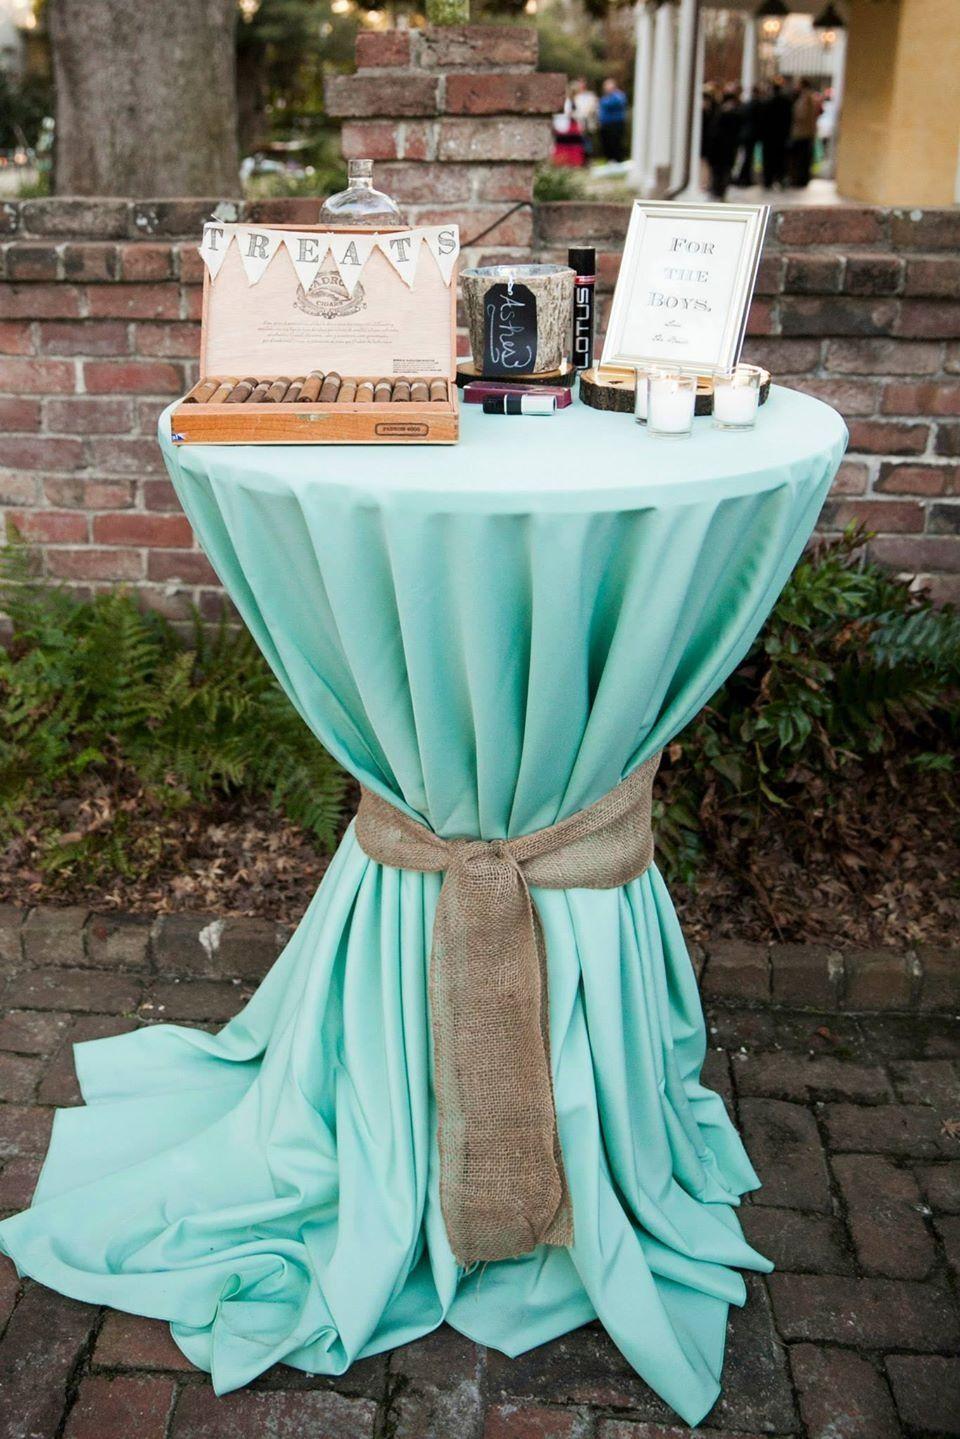 Cigar bar for the men! Such a cute idea! #wedding #cigar #bride ...